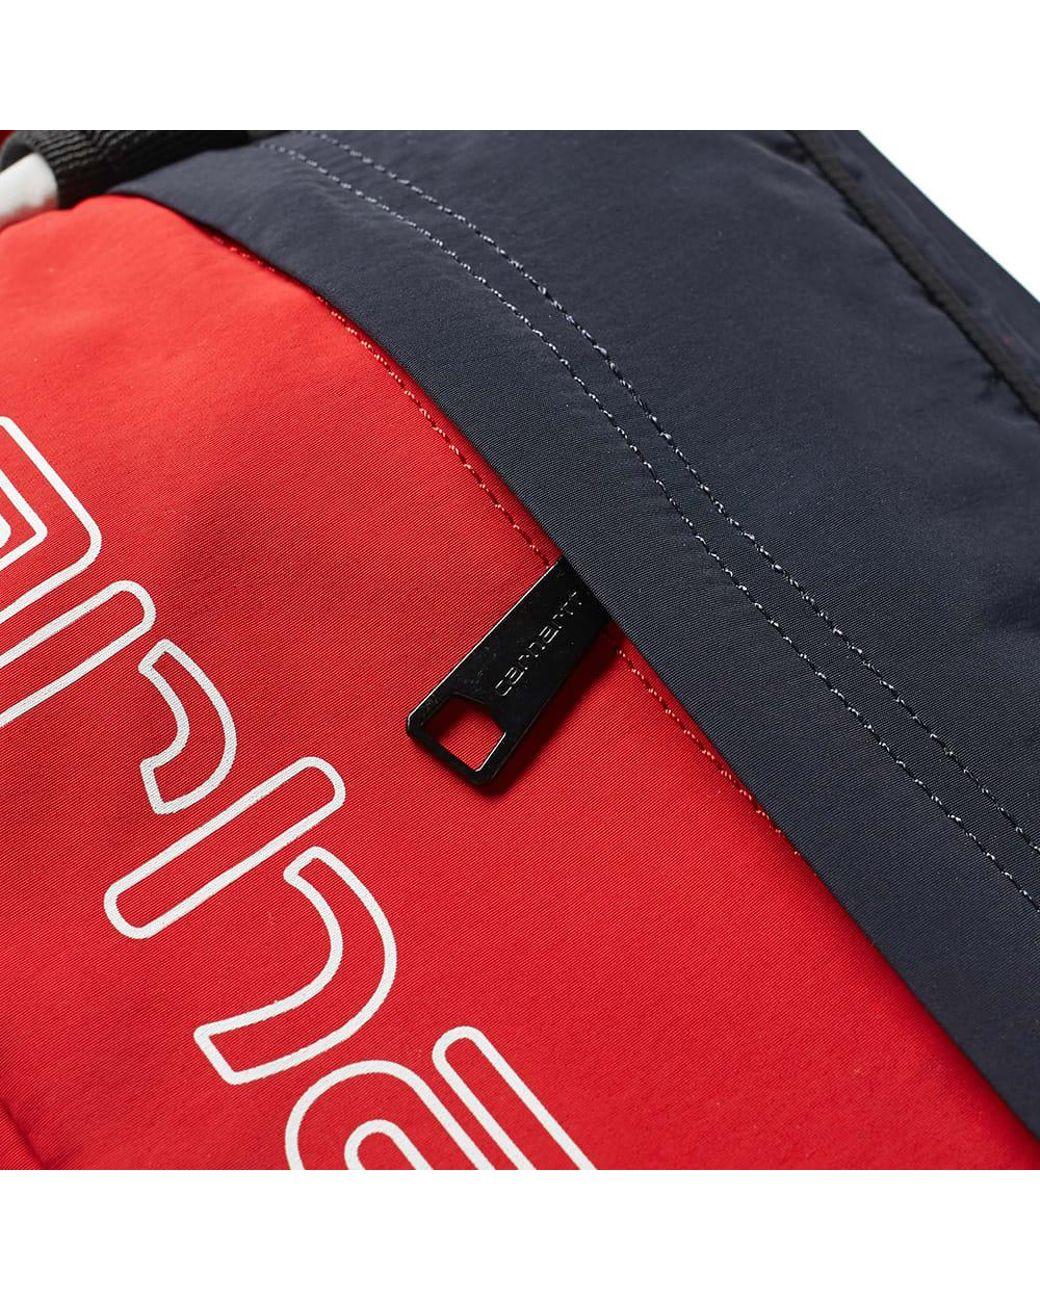 6d375951edb210 Carhartt WIP Carhartt Terrace Hip Bag in Red for Men - Lyst